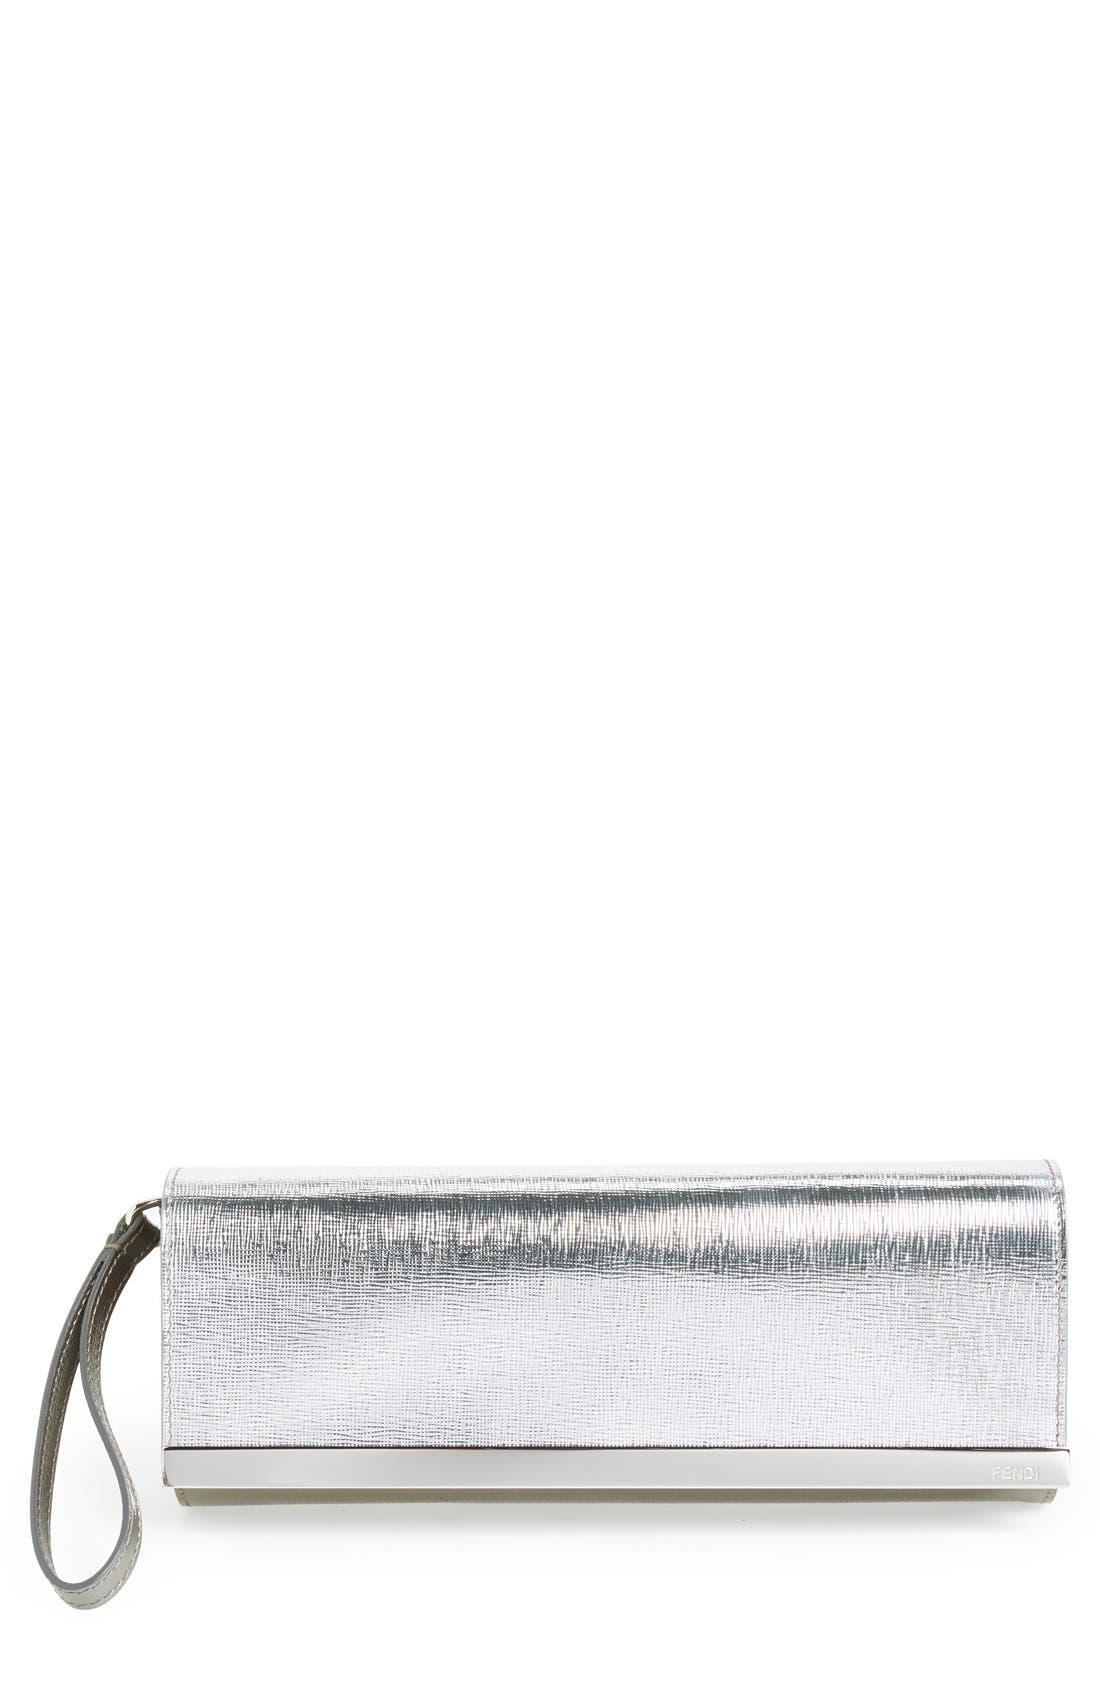 Alternate Image 1 Selected - Fendi 'Vernice Bicolor Rush' Metallic Leather Pochette Clutch